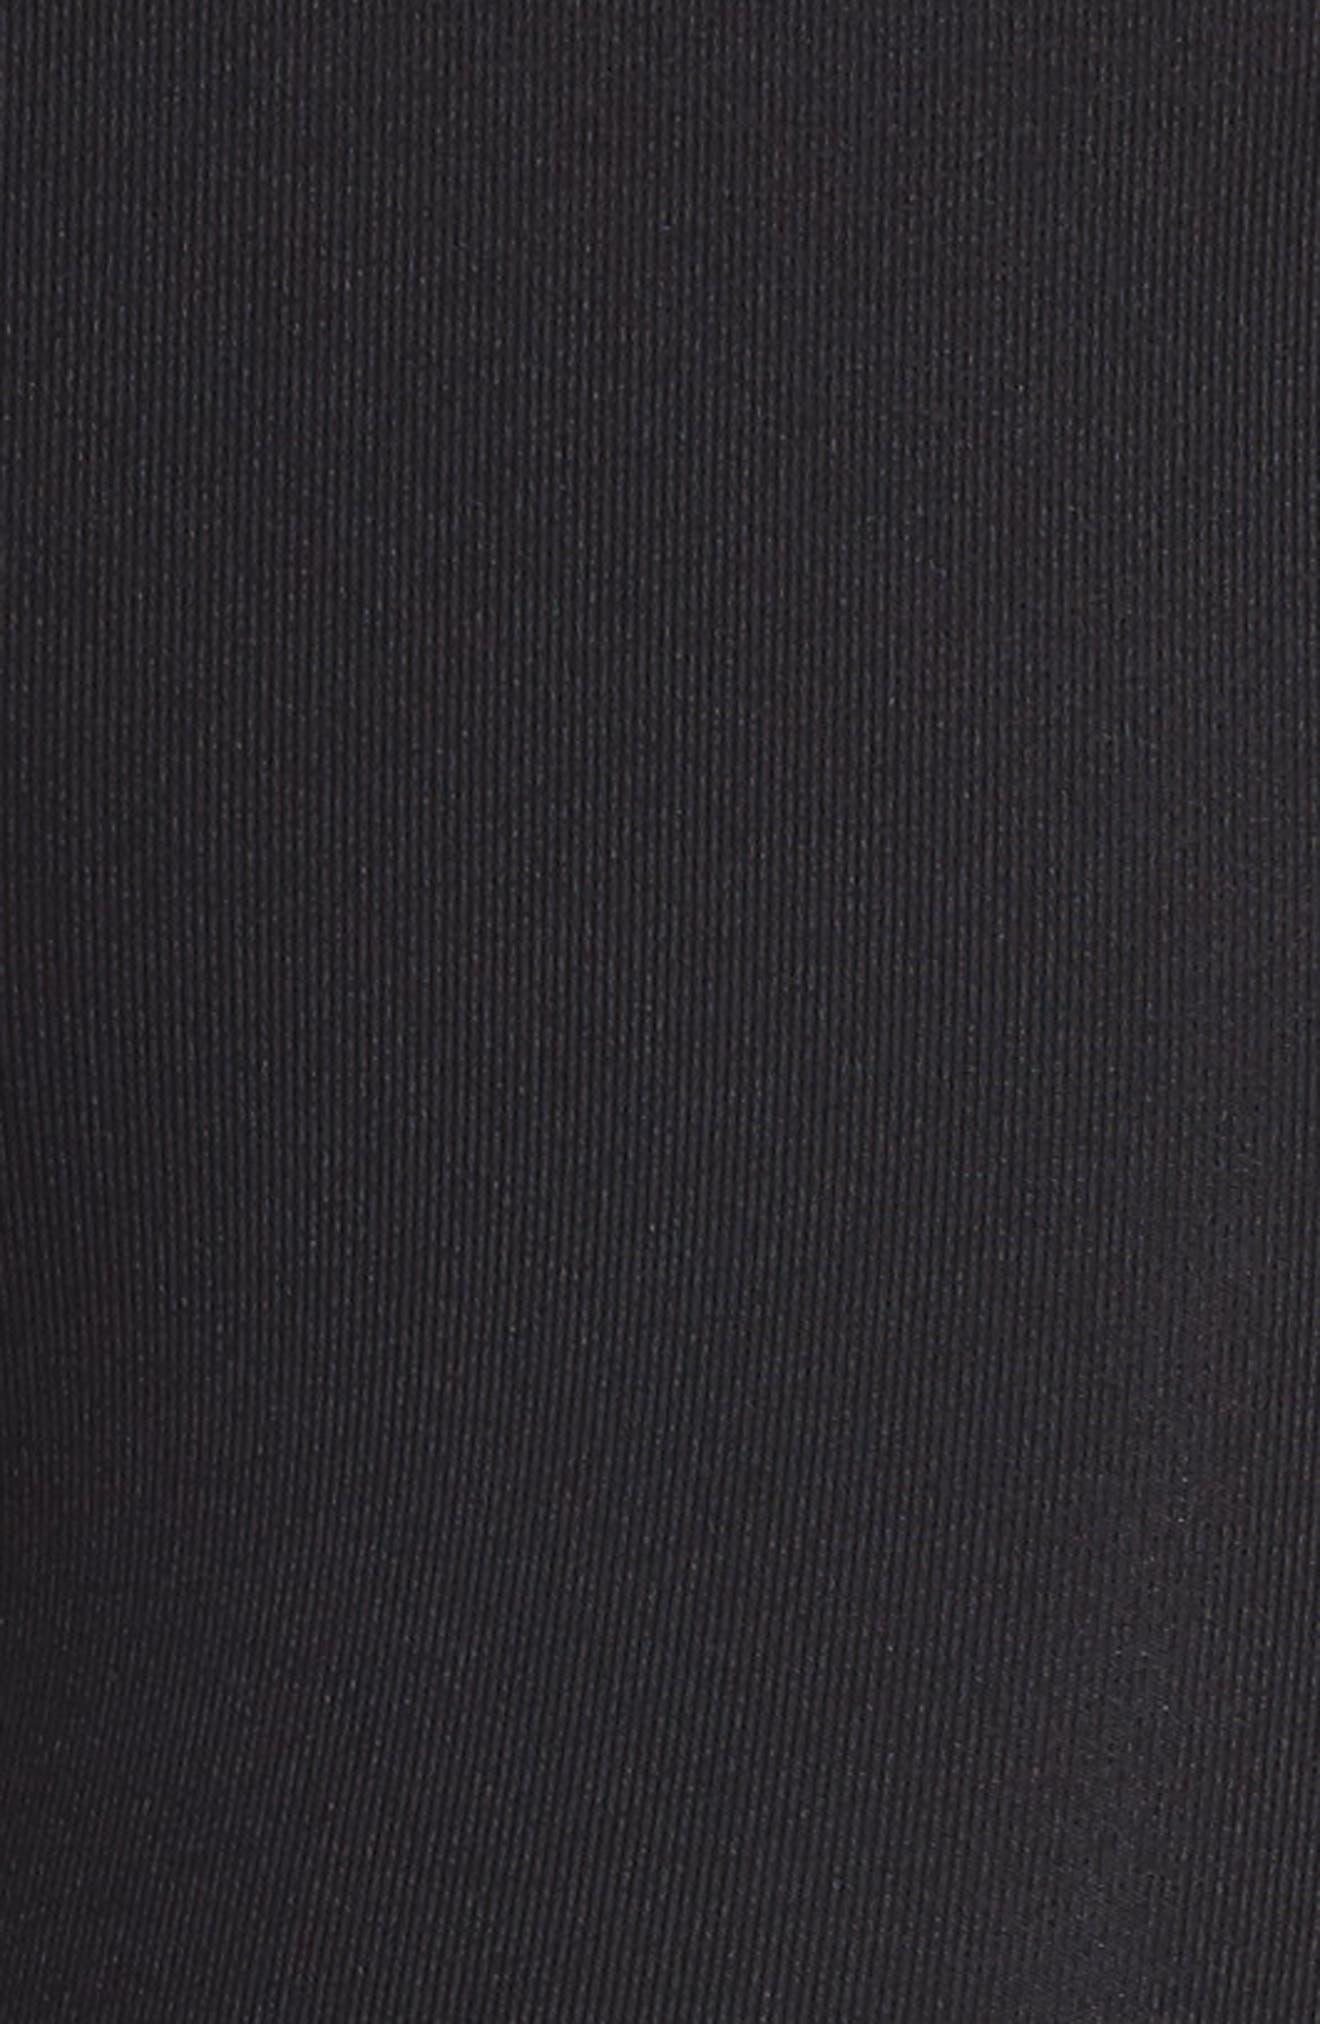 High Rise Lucent Crop Leggings,                             Alternate thumbnail 6, color,                             Black